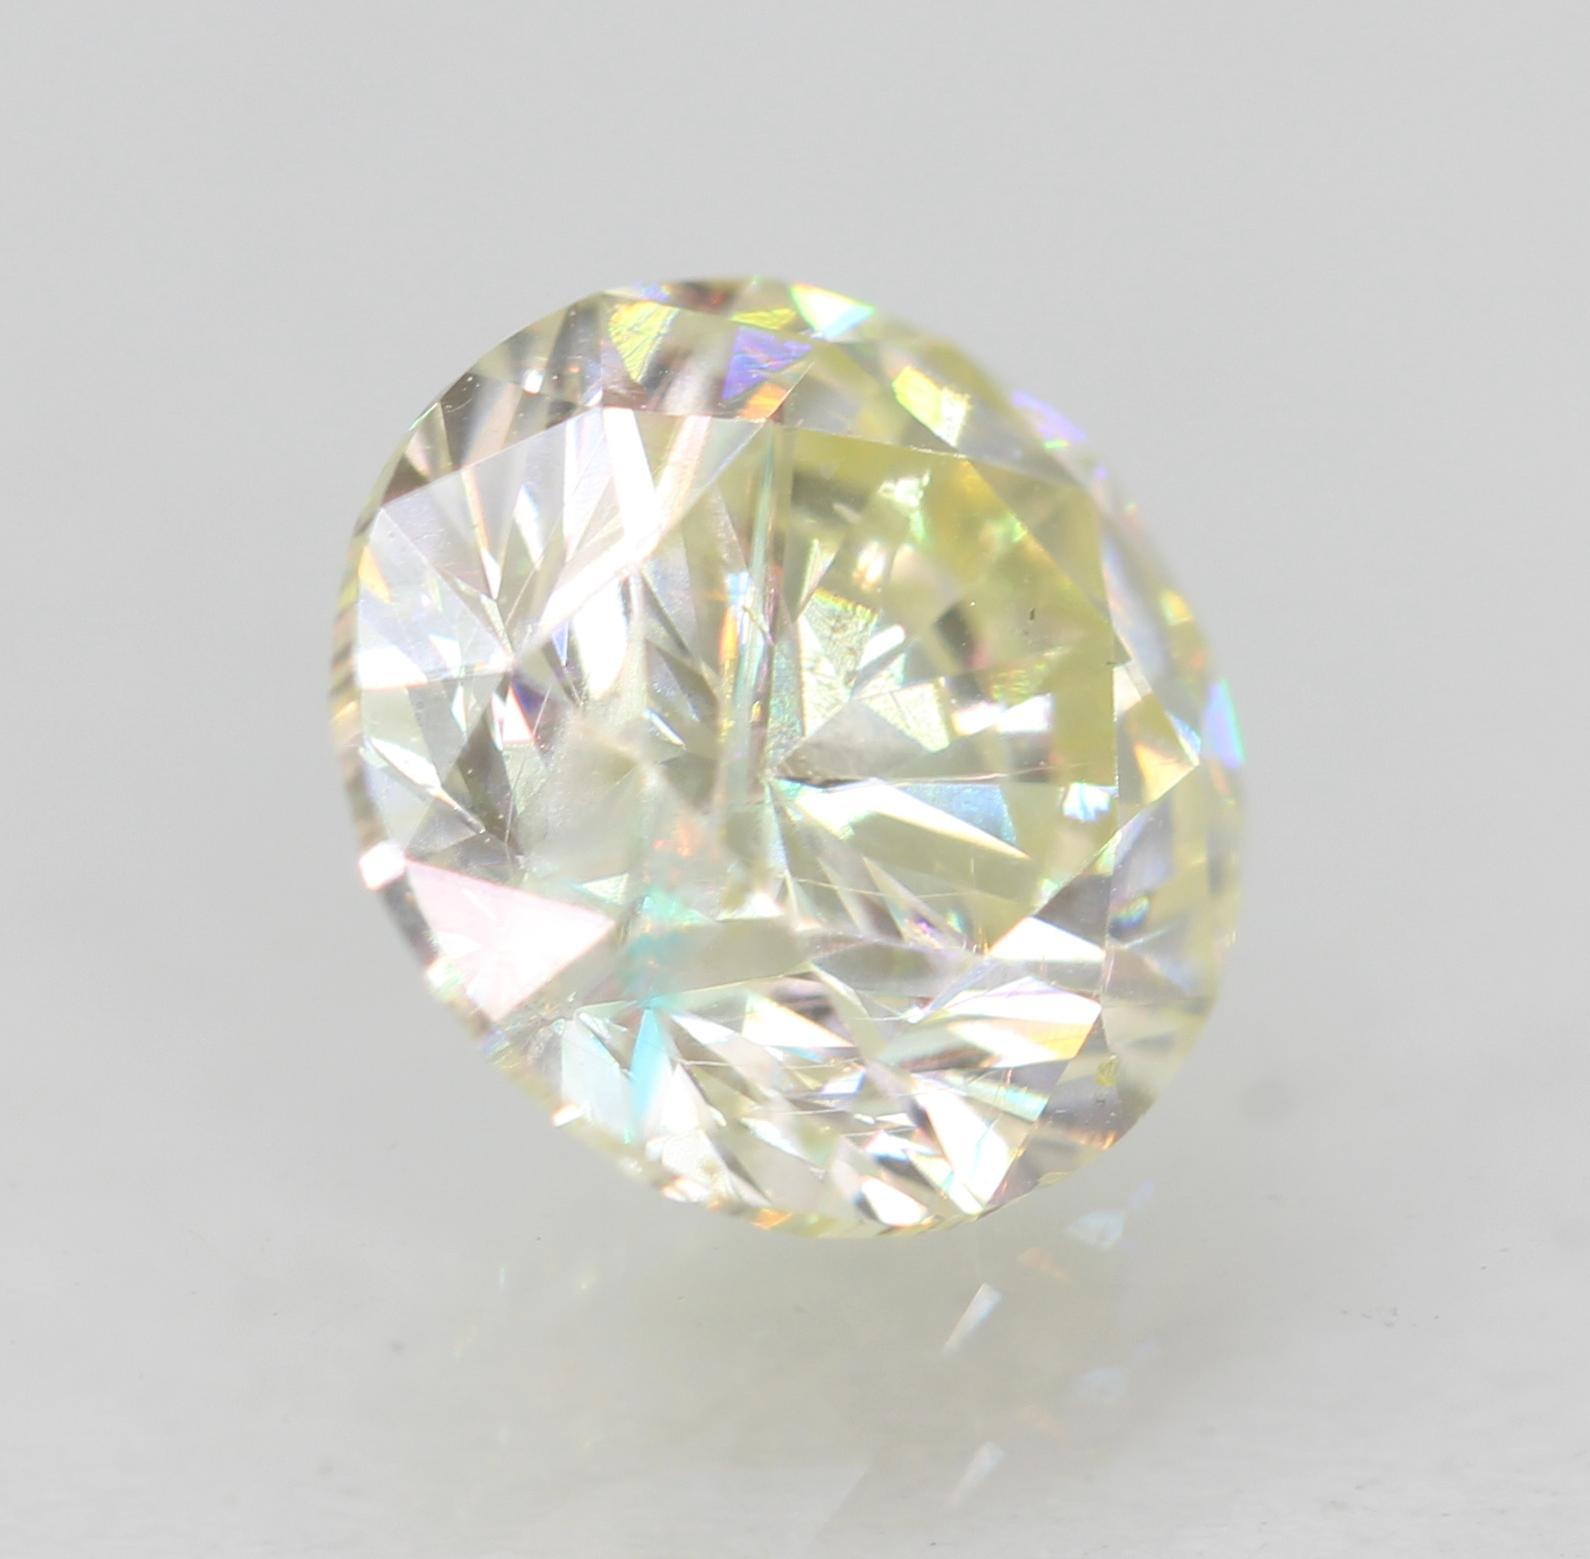 Certified 1.08 Carat J VS1 Round Brilliant Enhanced Natural Diamond 6.41m EX CUT